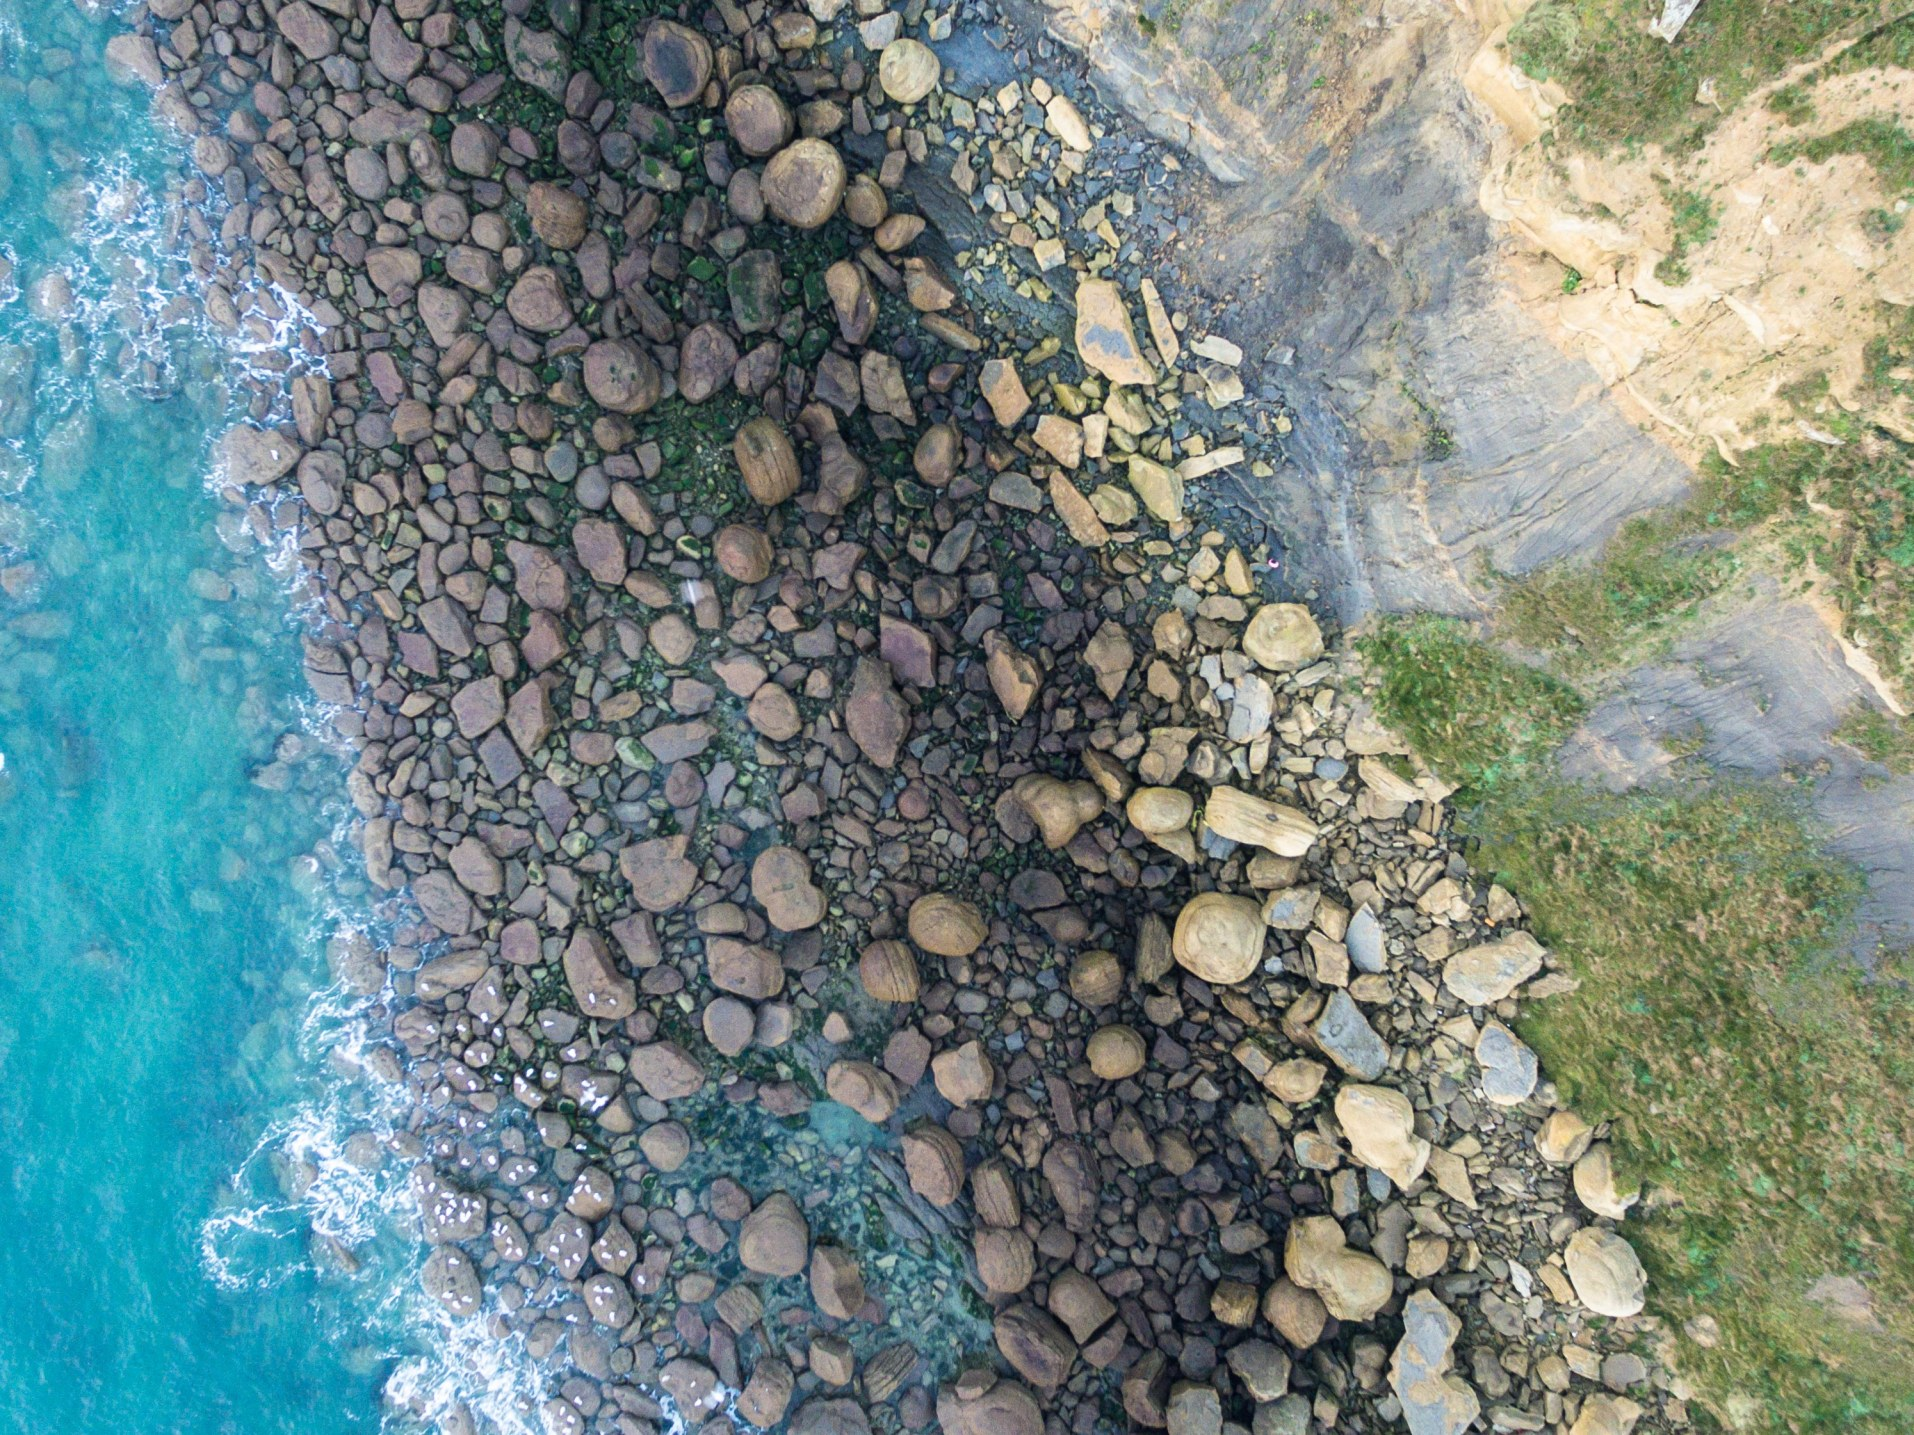 lidar-topographie-imagerie-aerienne-surveillance-berges